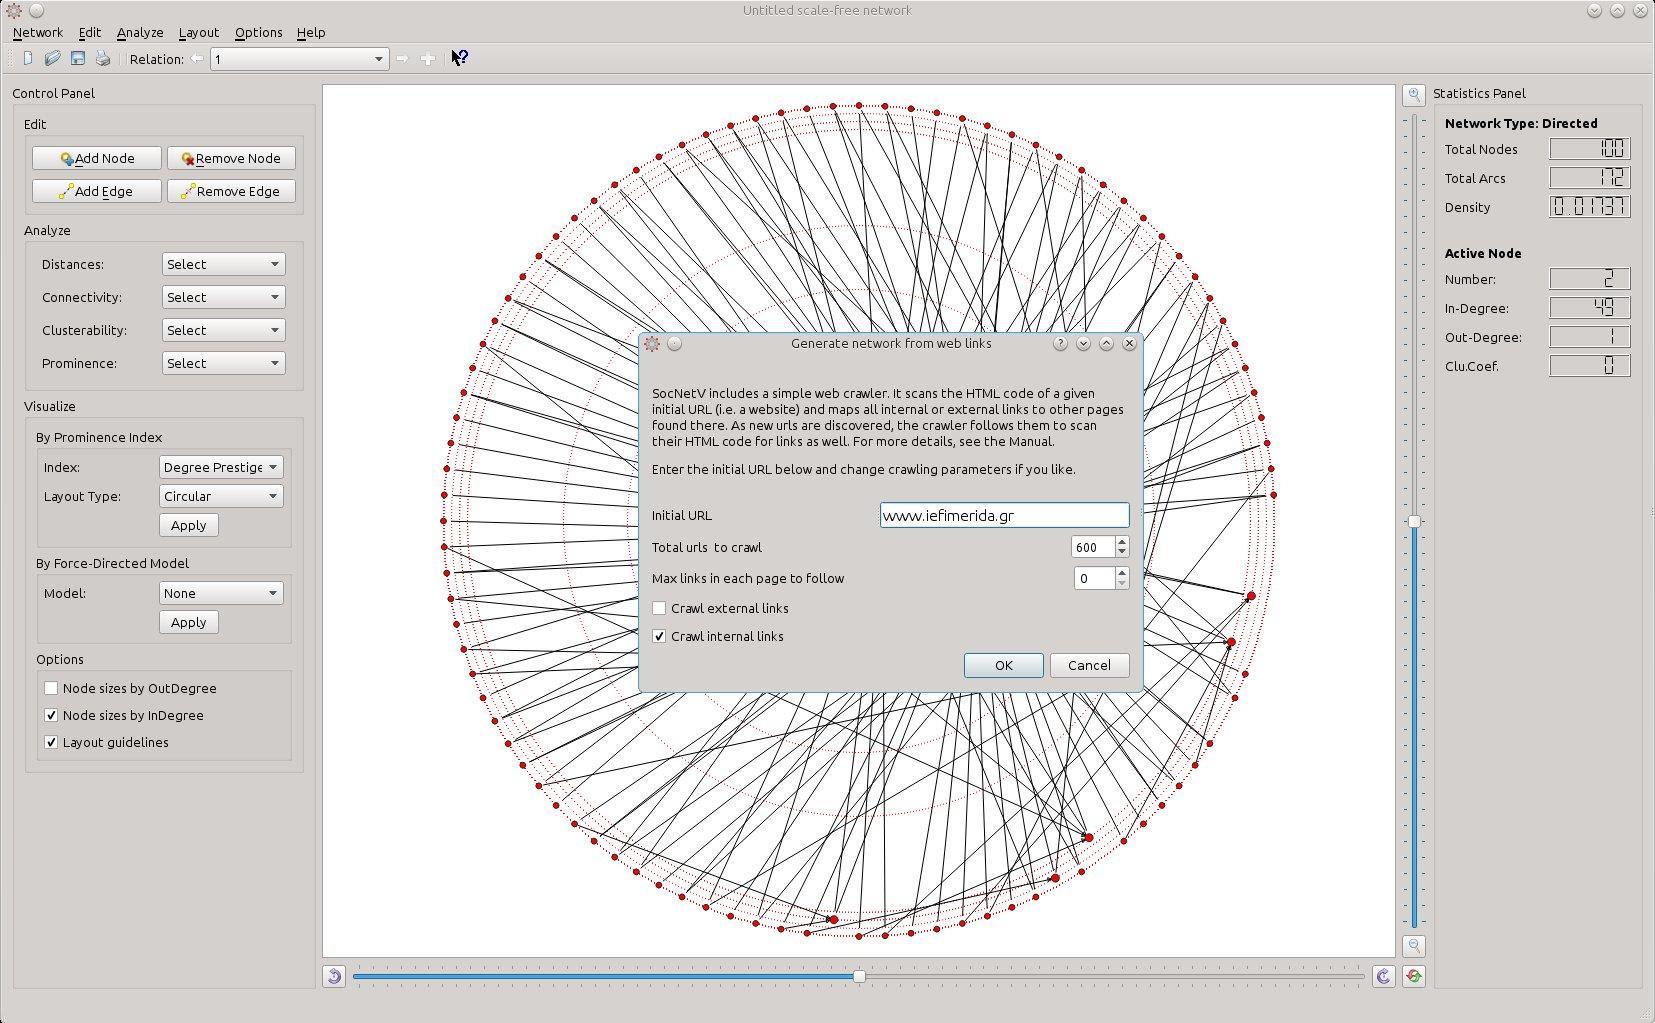 socnetv-social-network-analysis-web-crawler-dialog.jpg